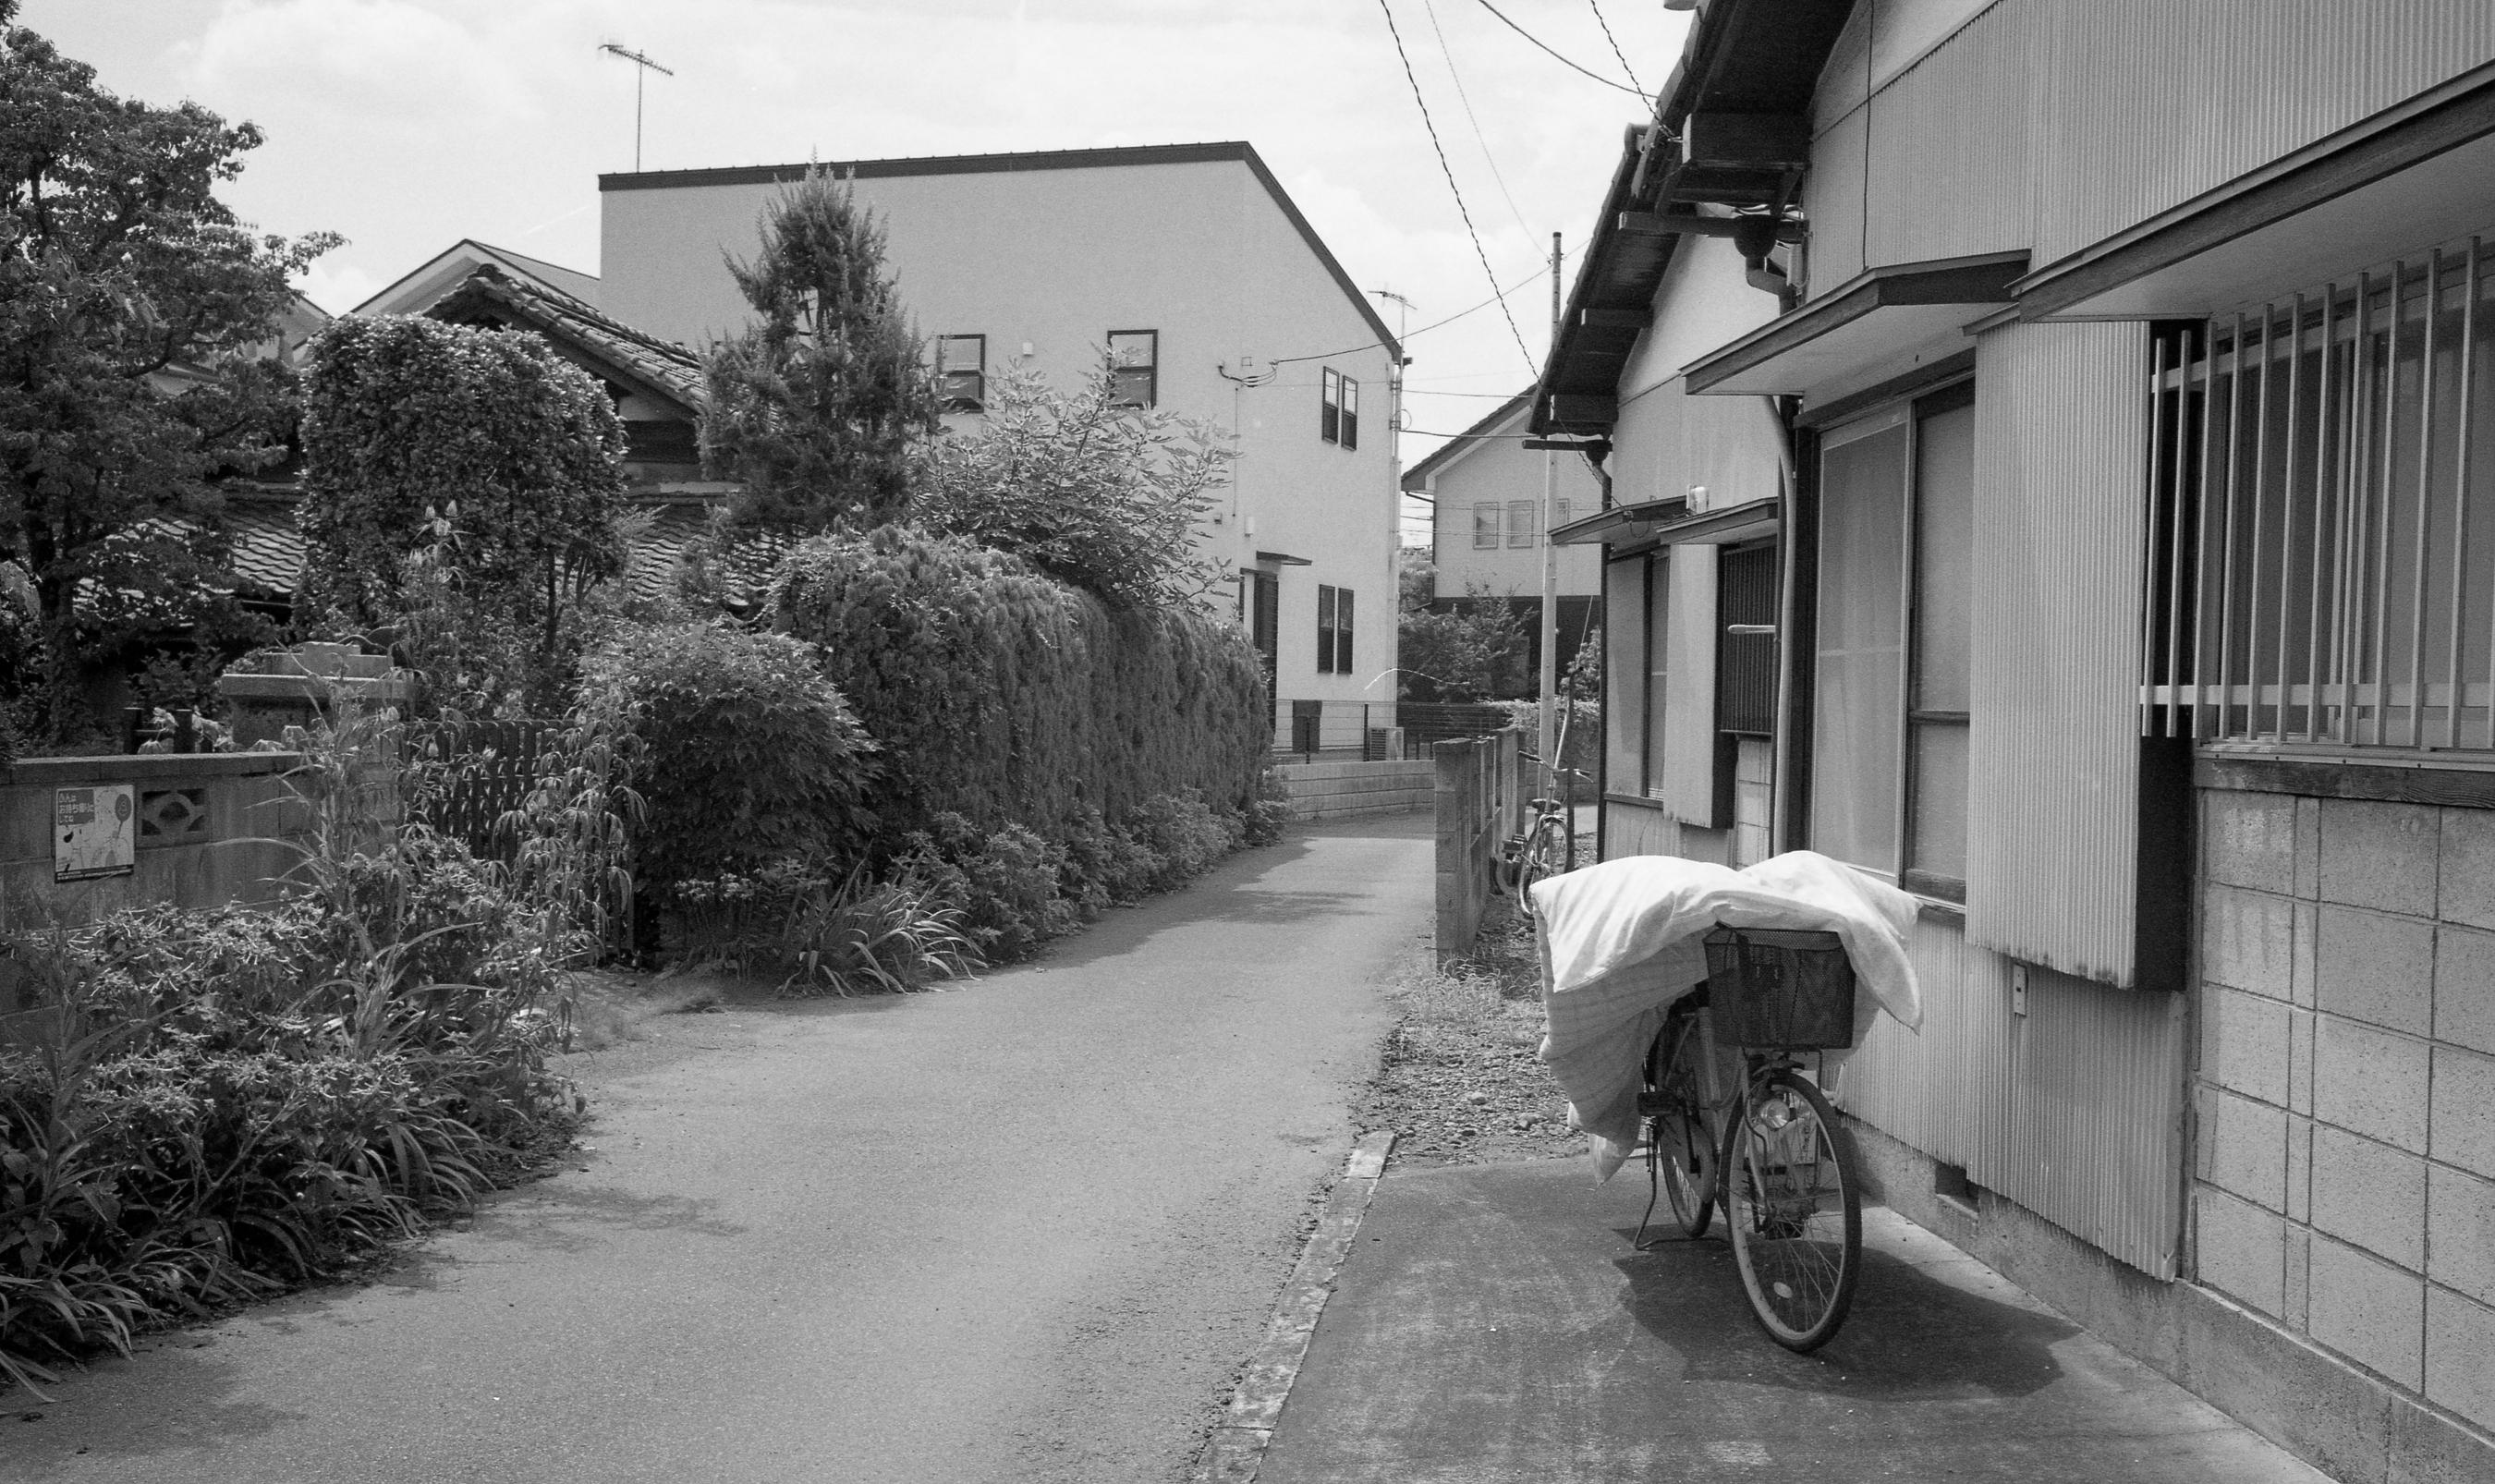 f:id:aoyama-takuro:20180804221740j:plain